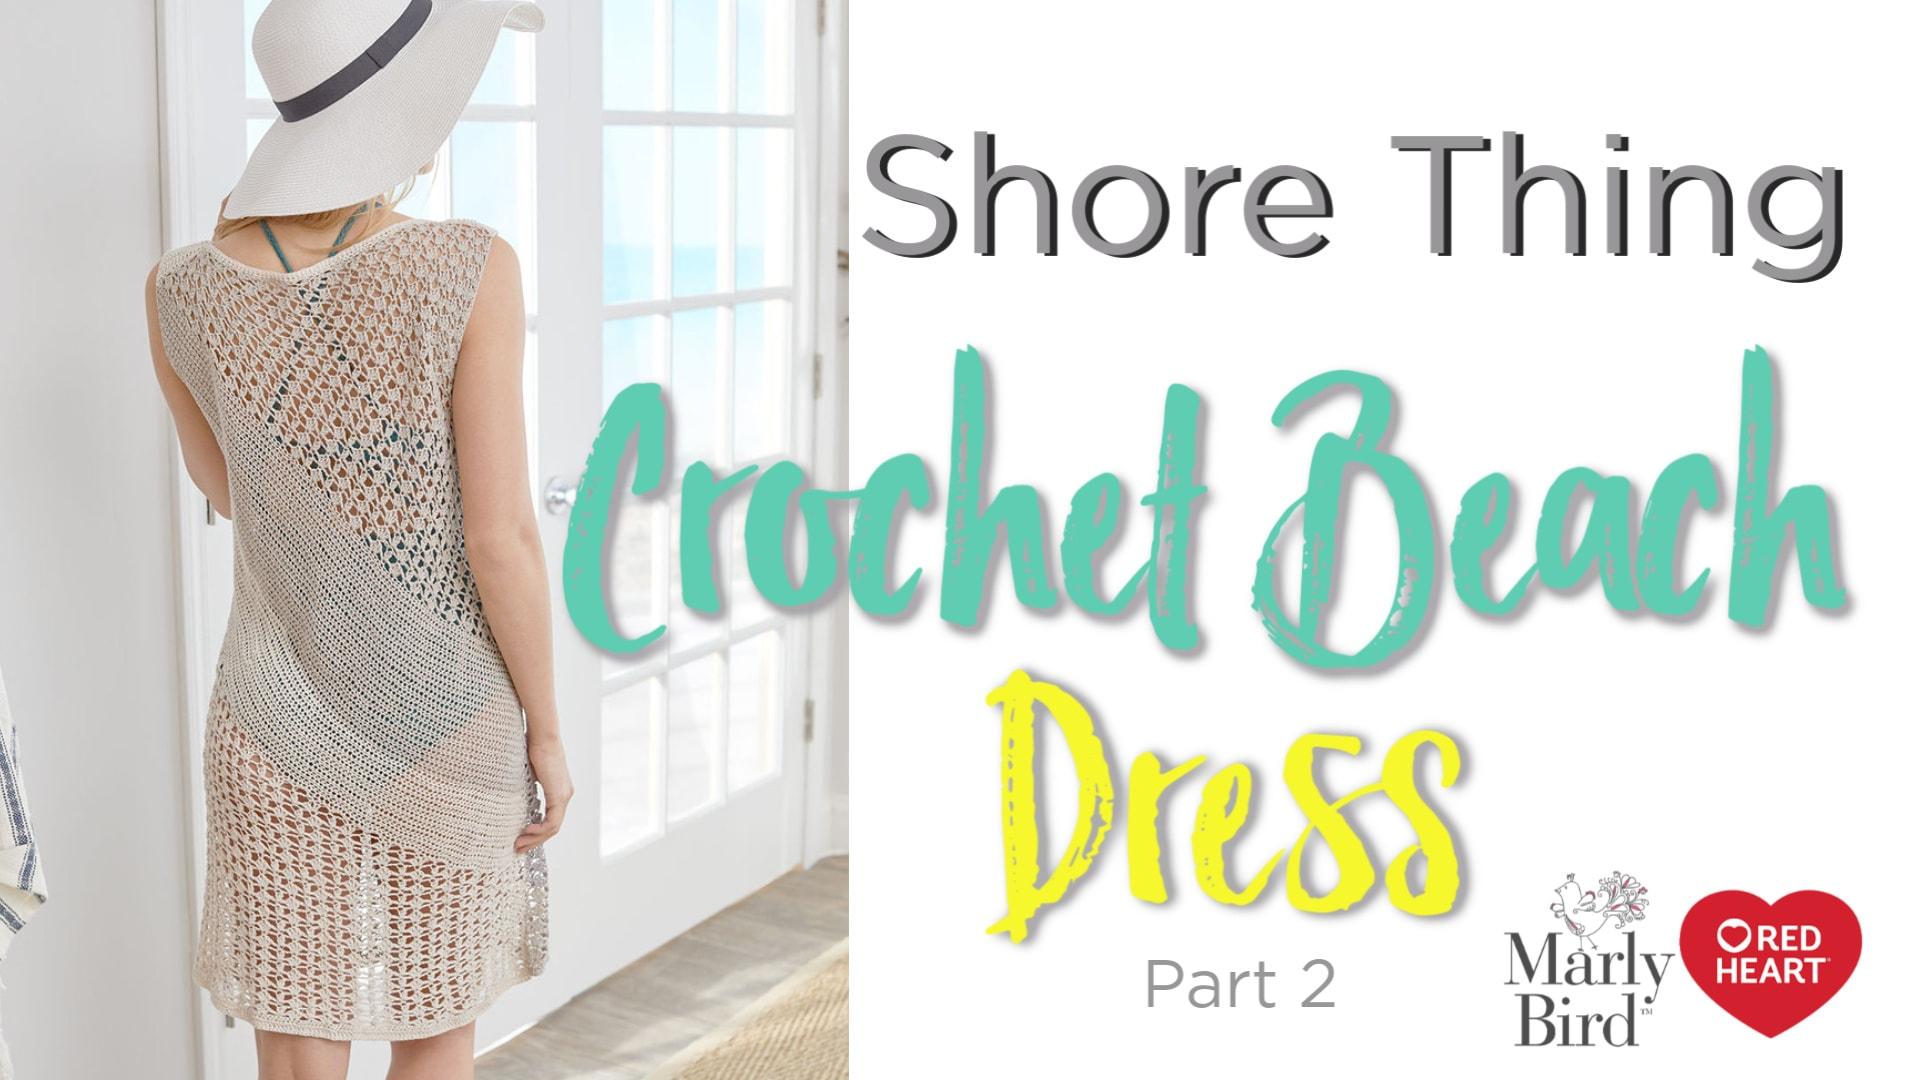 How to Crochet the Shore Thing Crochet Beach Dress Part 2